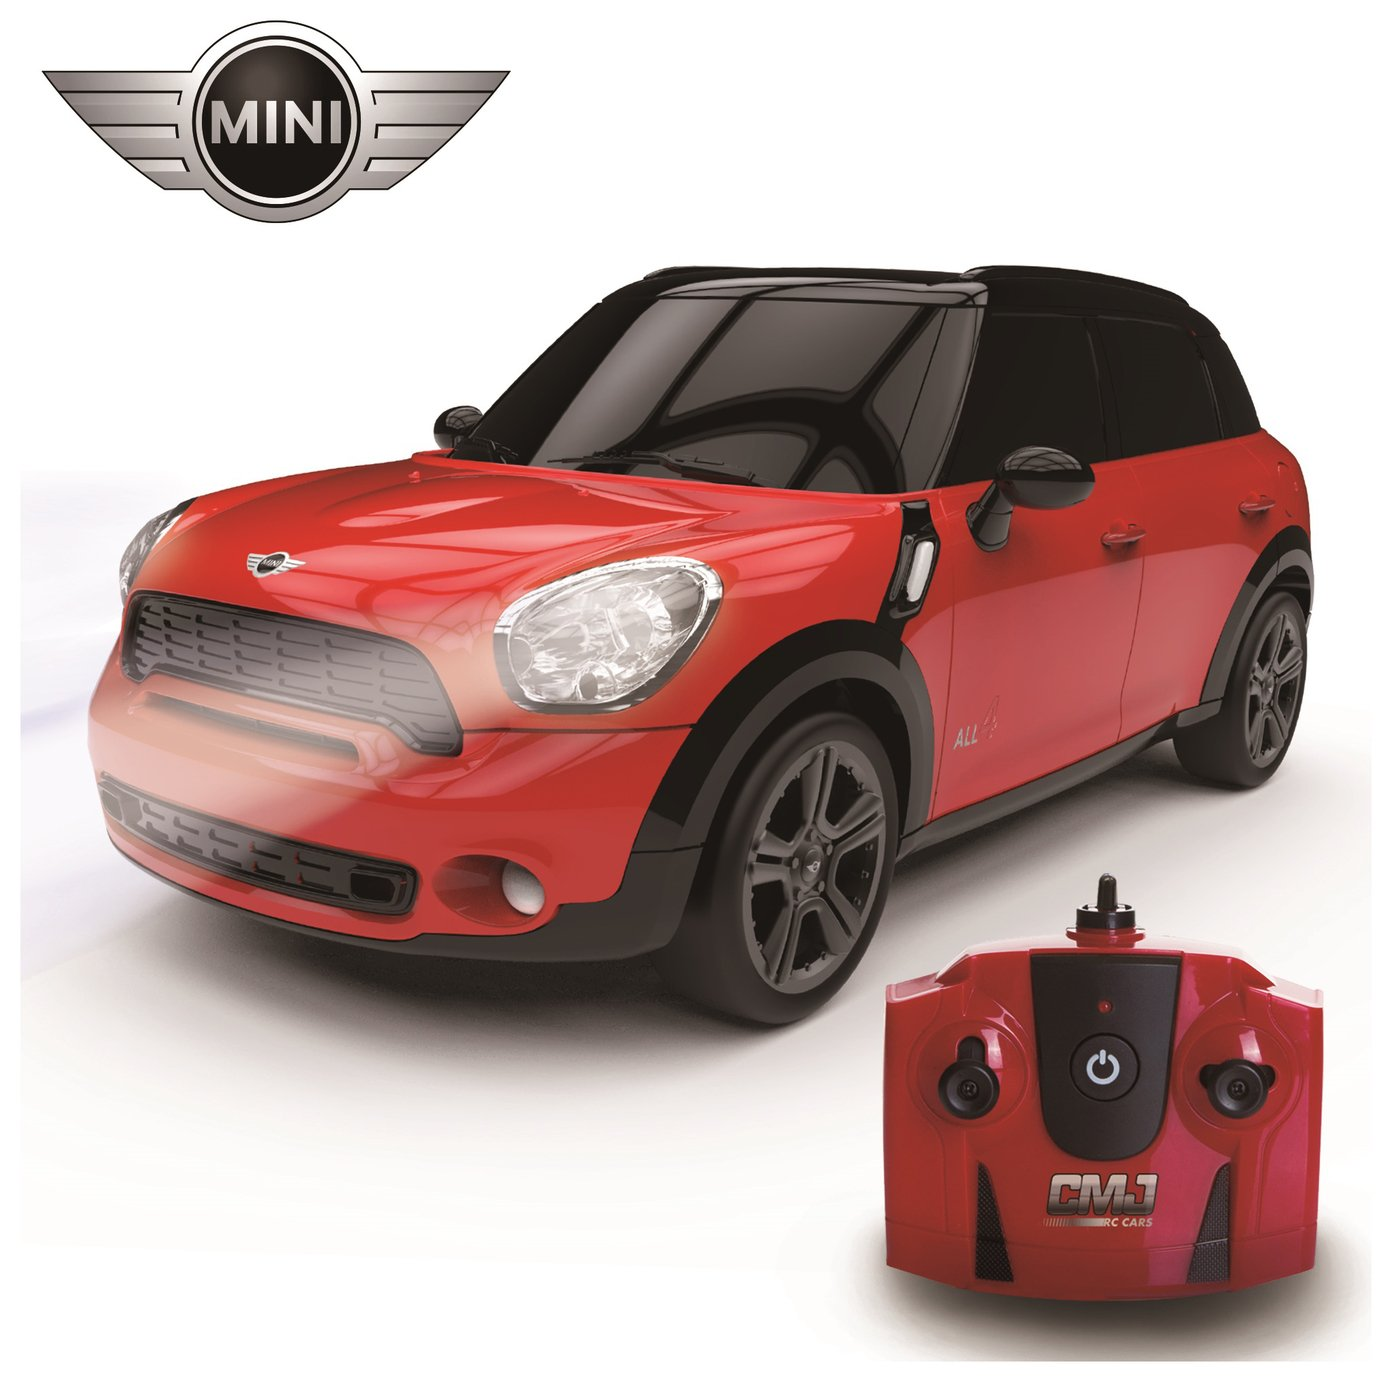 Mini Countryman JCW Remote Control Car 1:24 Red 2.4Ghz